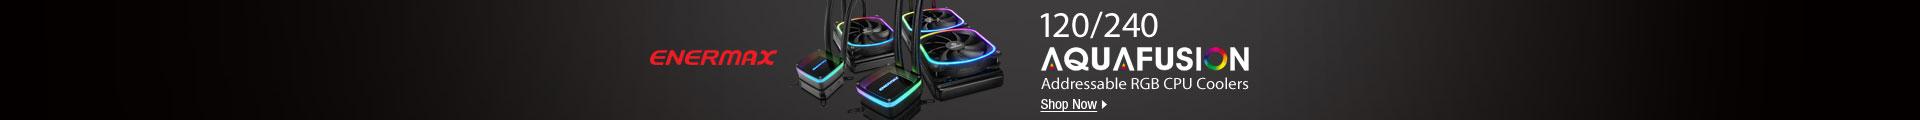 Computer Heatsinks, CPU Fans and Coolers - Newegg com